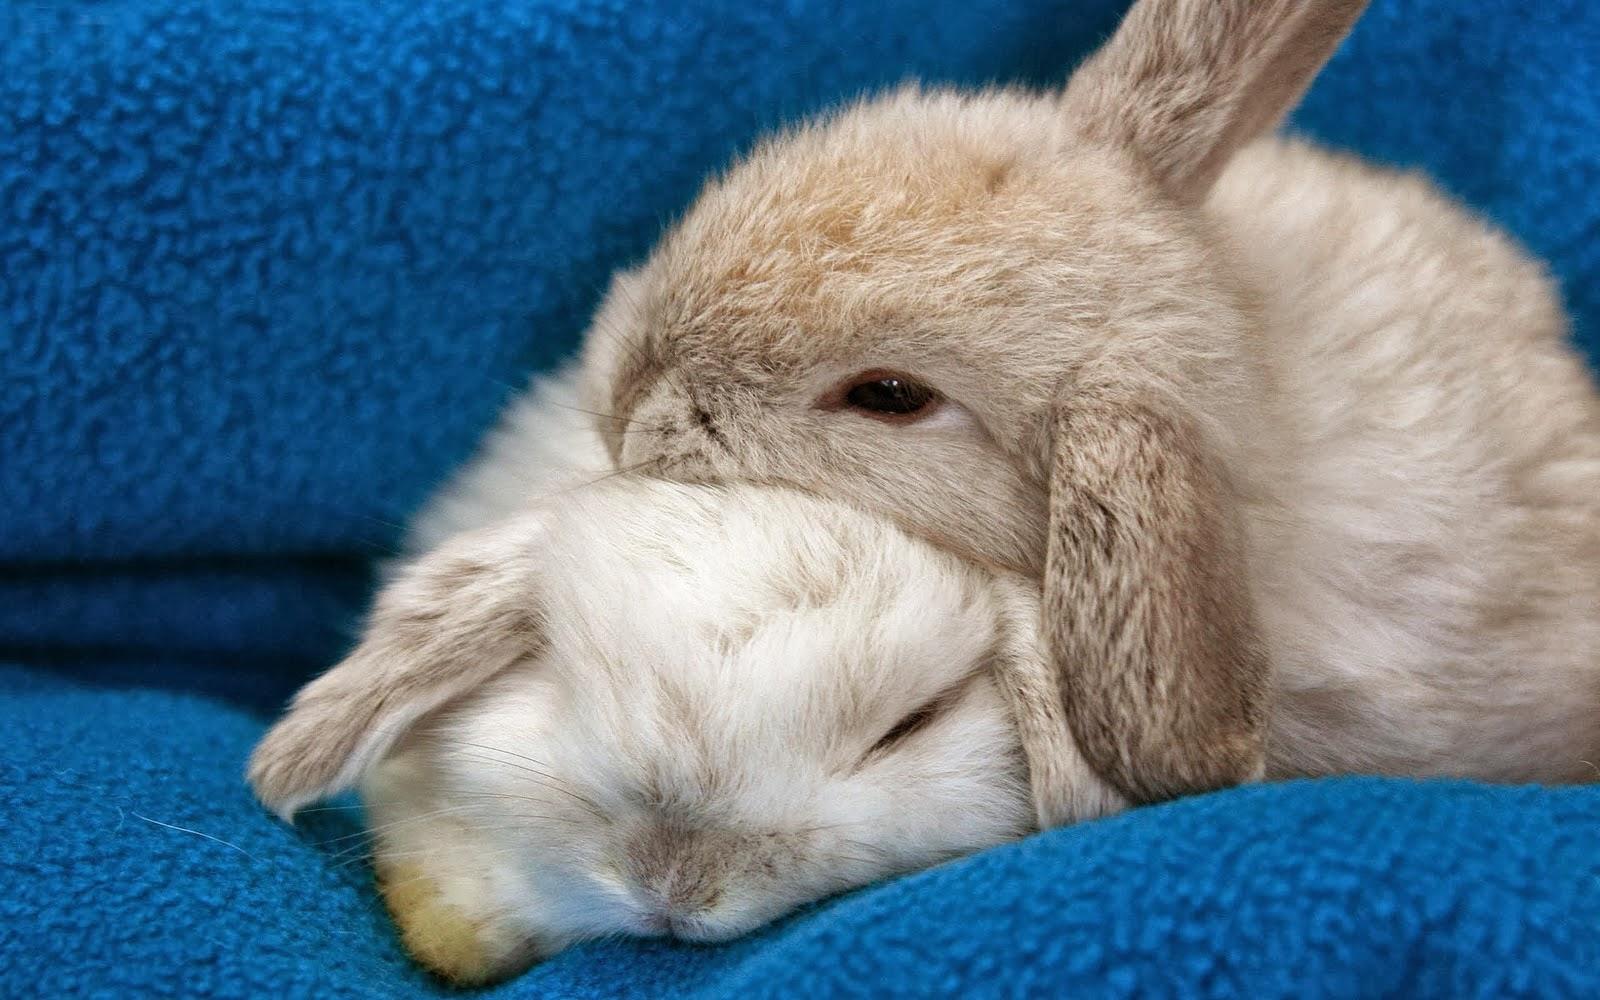 Animals Hd Wallpapers 2015 Funny Kissing Hugging Baby: Baby Bunny Wallpaper Desktop